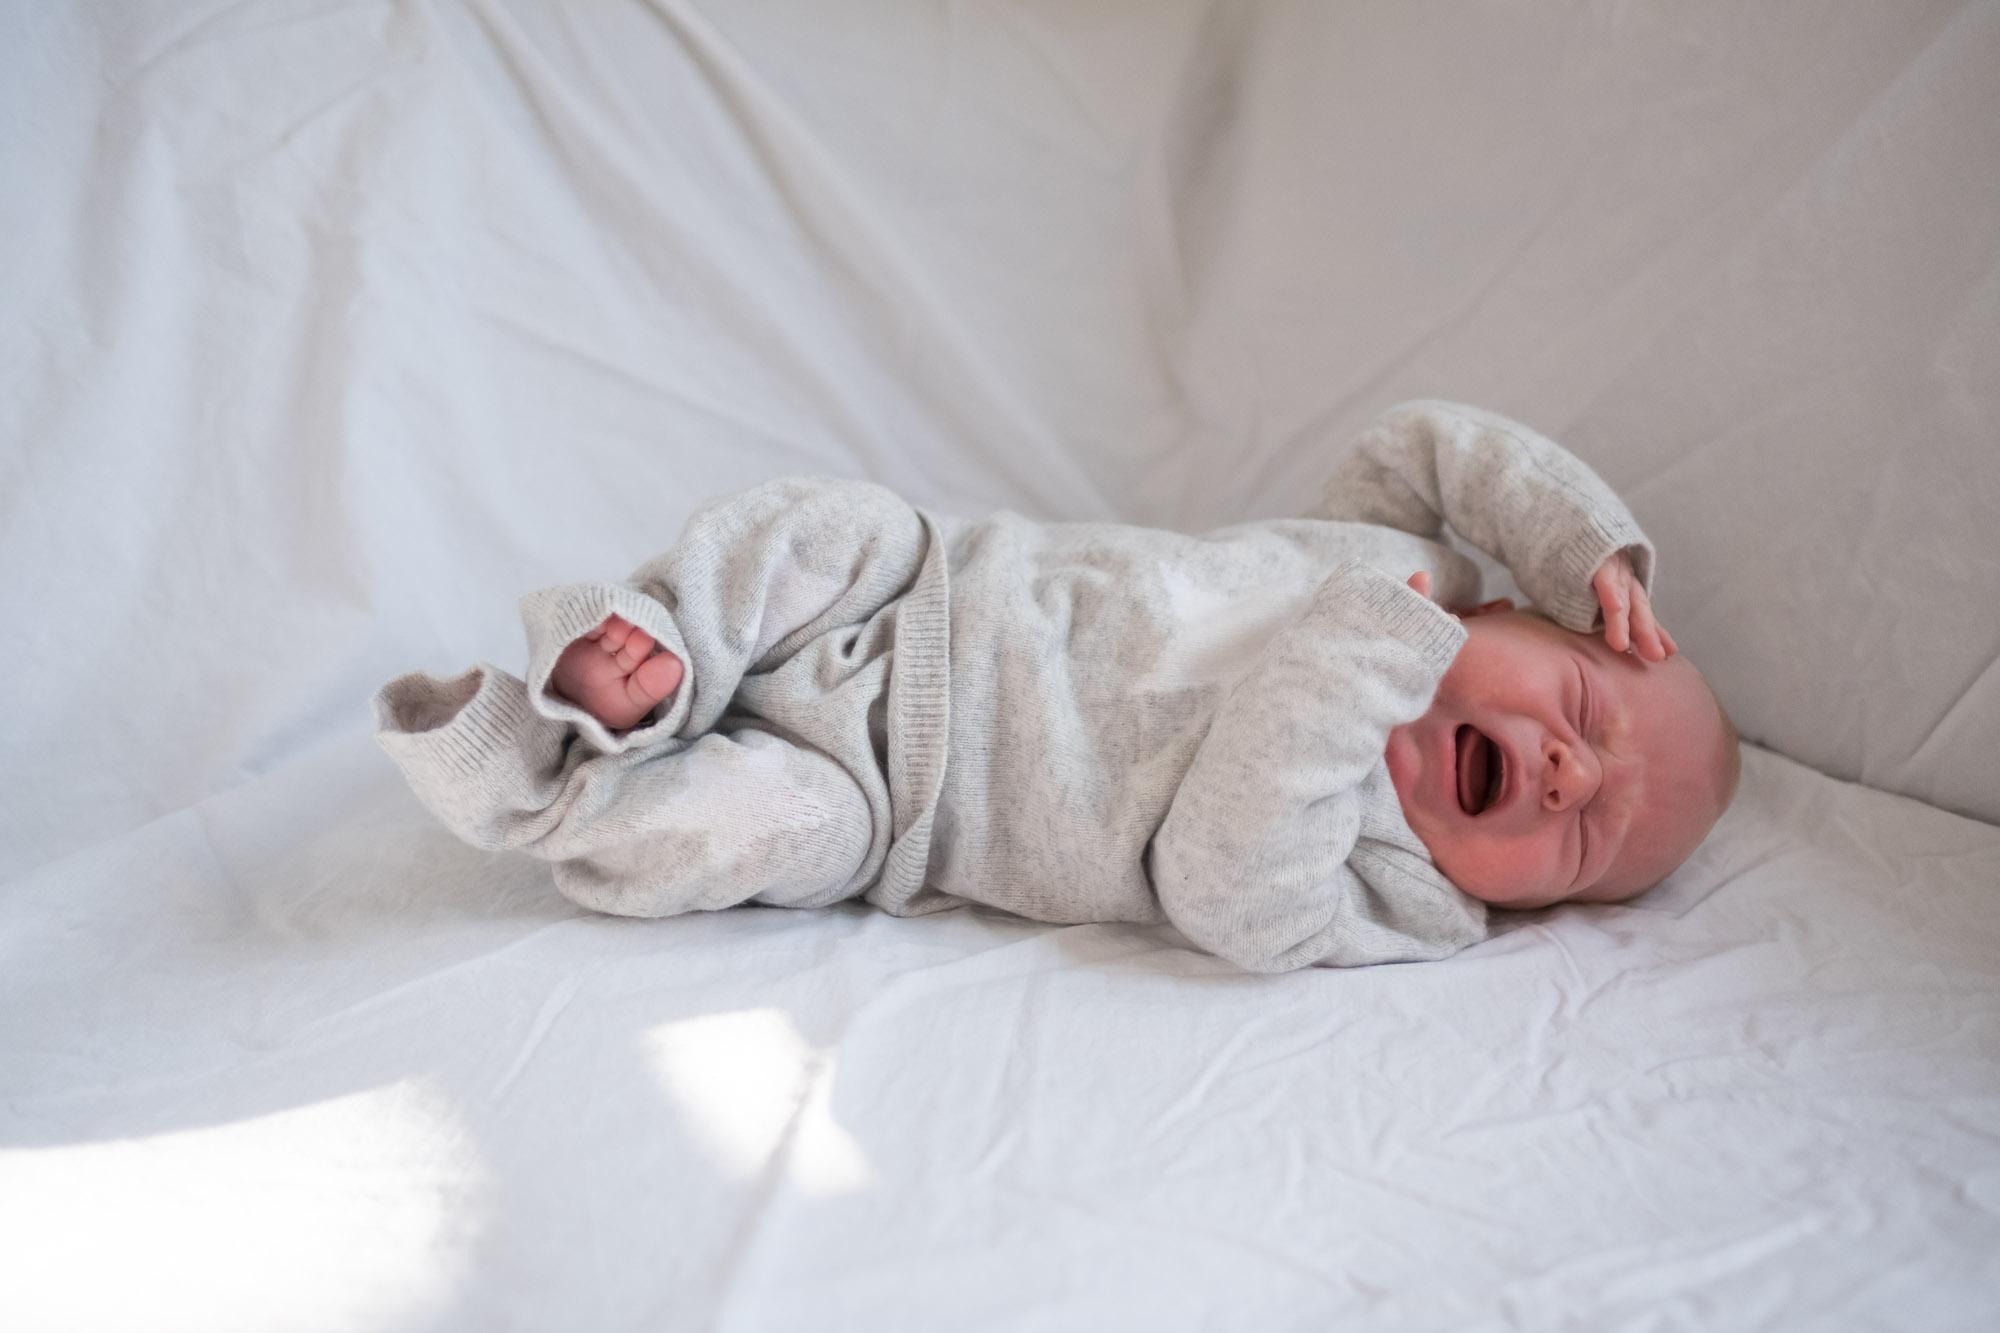 family-portrait-baby-photographer-081.jpg